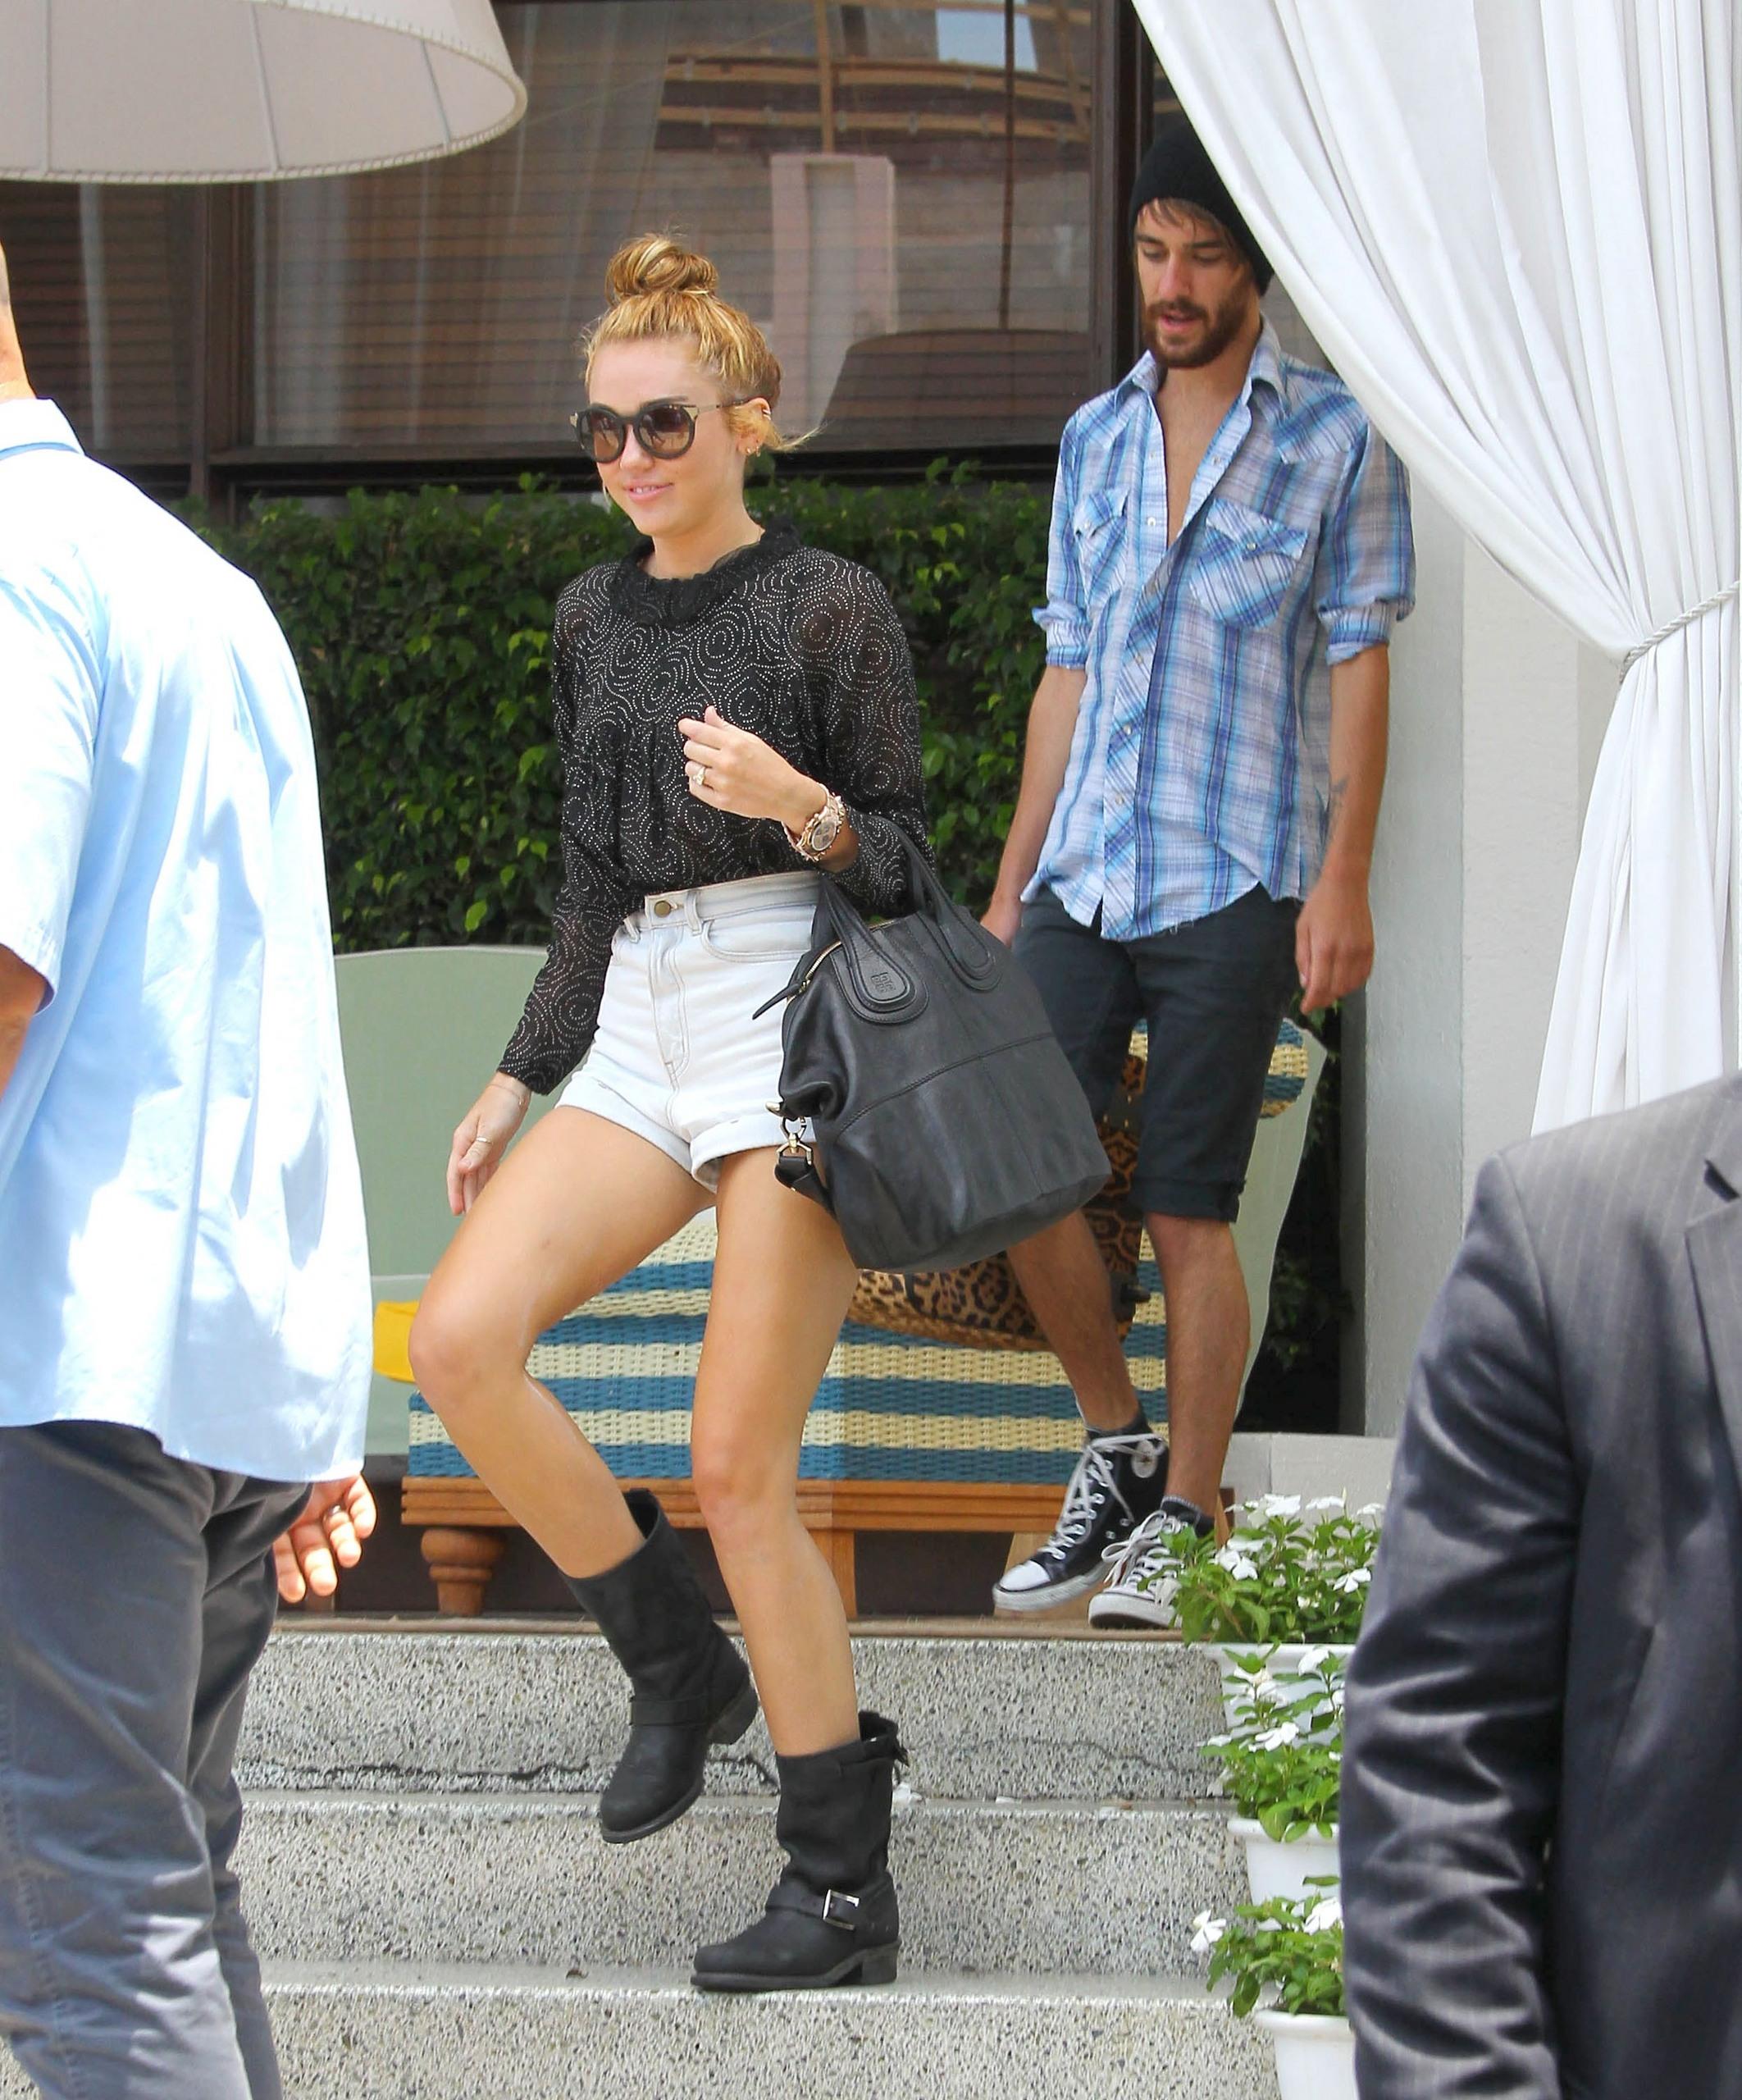 Leaving Her Hotel In Miami [15 June 2012]